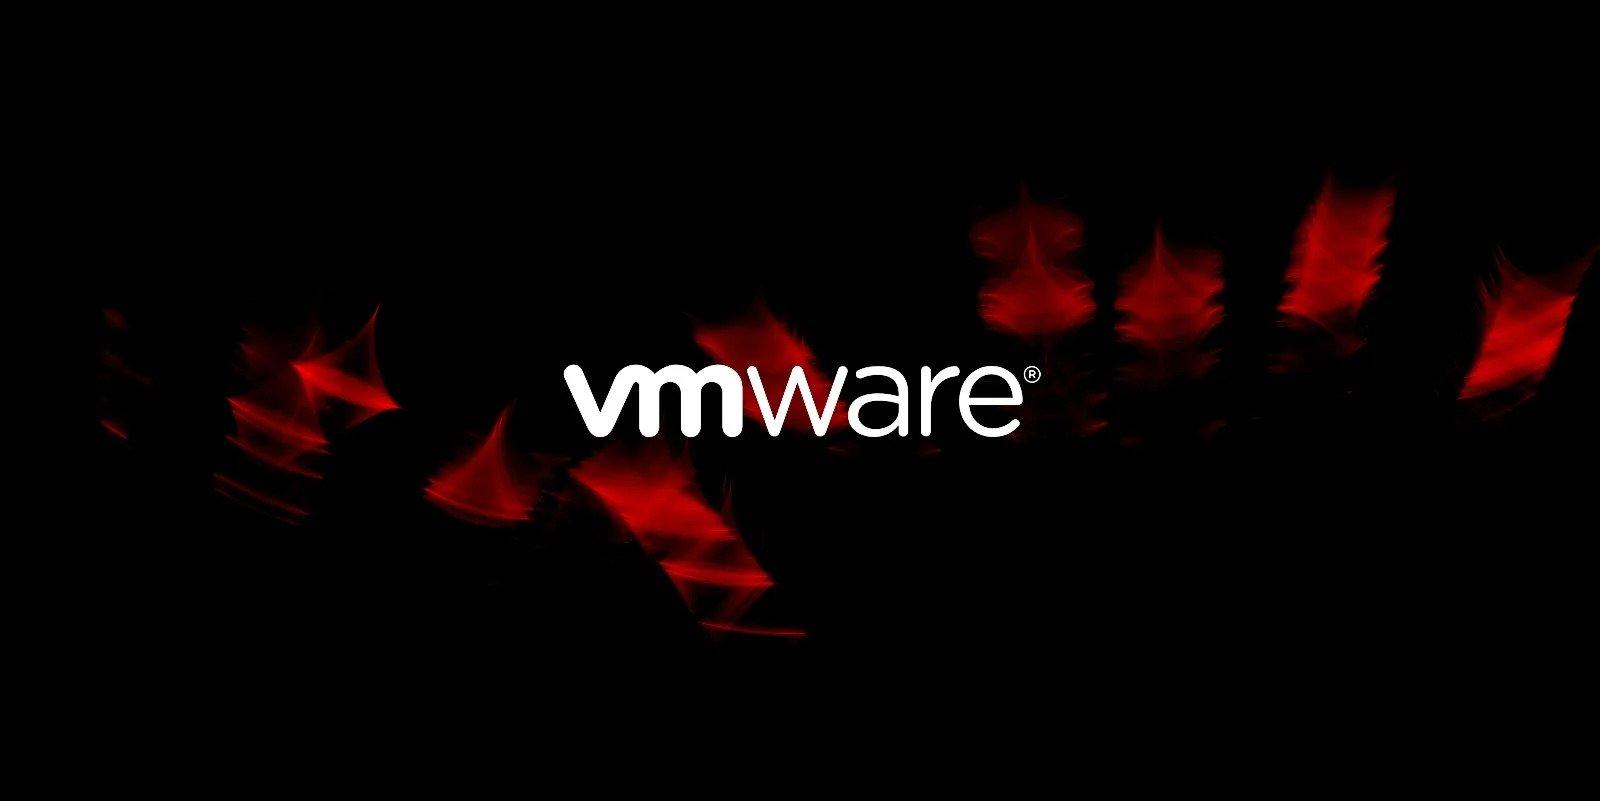 vmware کارمندان خود را دورکار کرد